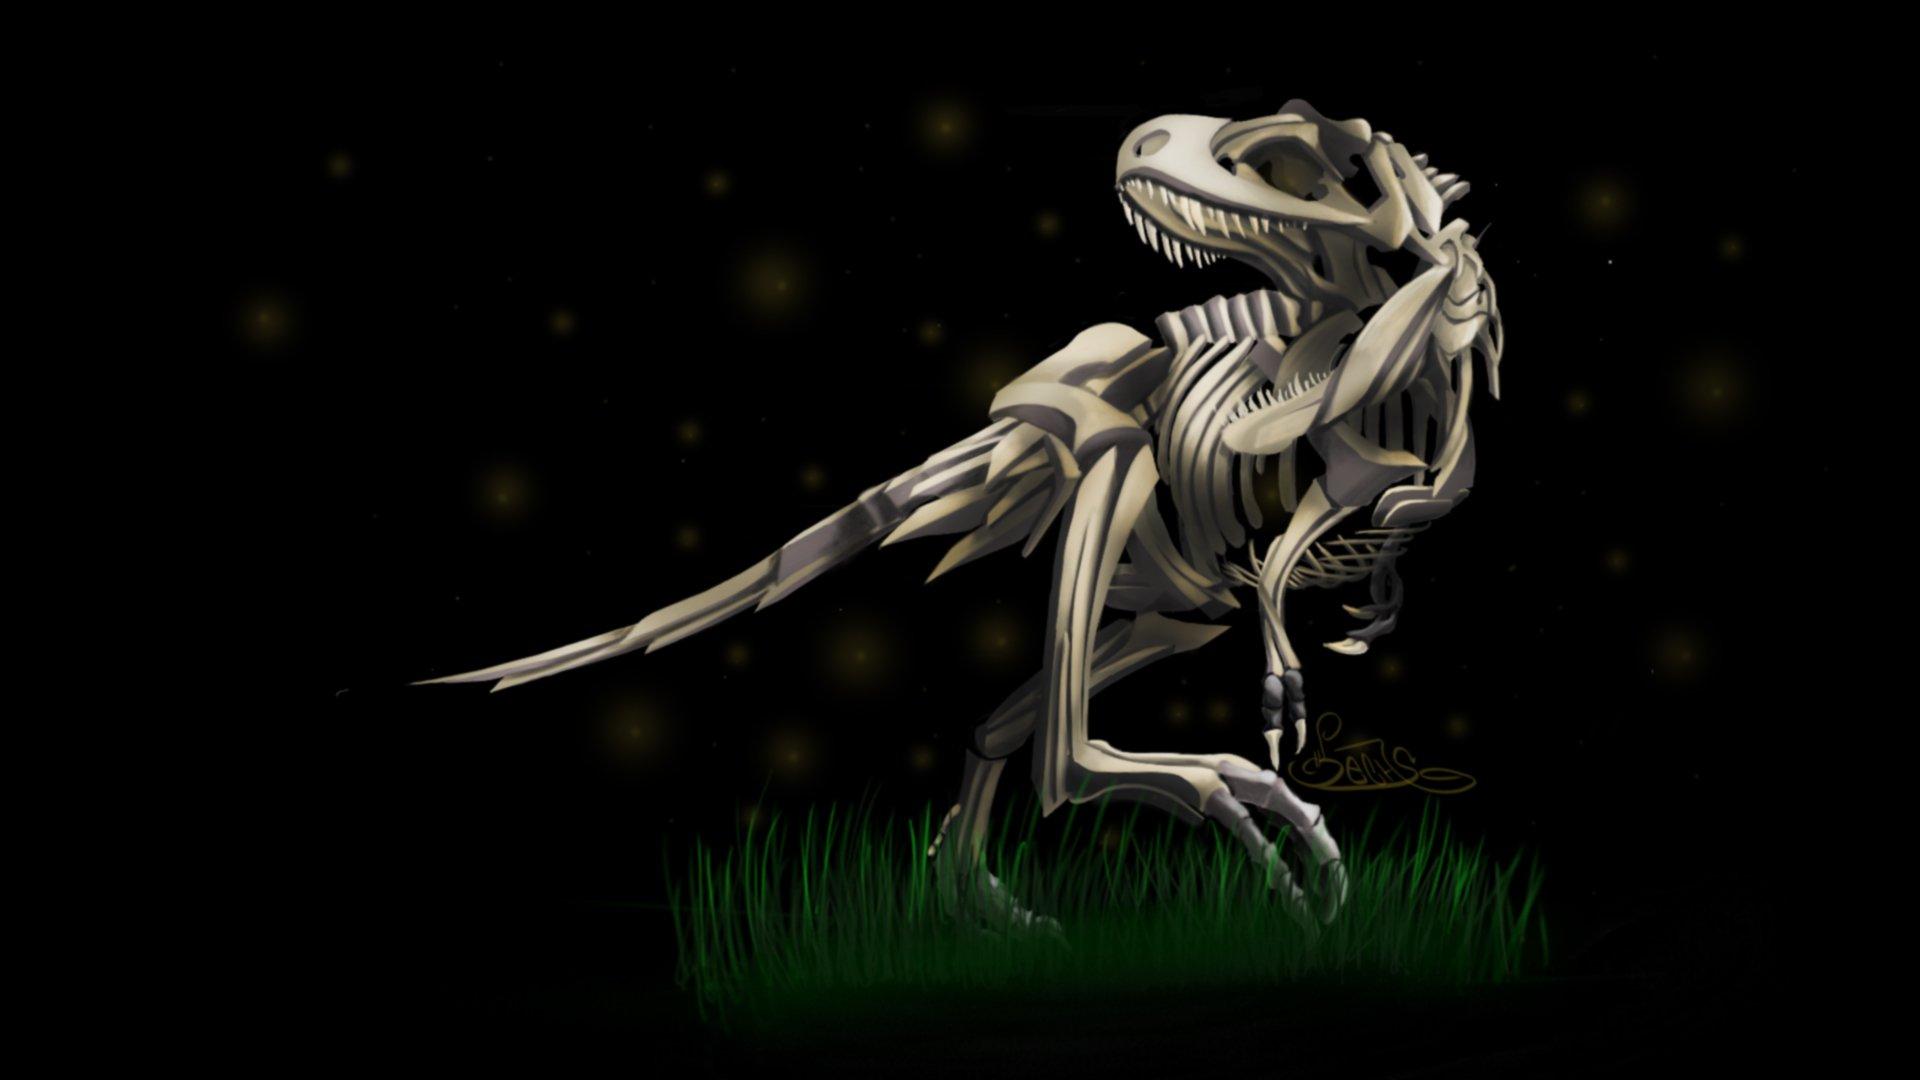 Dinosaur HD Wallpaper   Background Image   1920x1080   ID ...